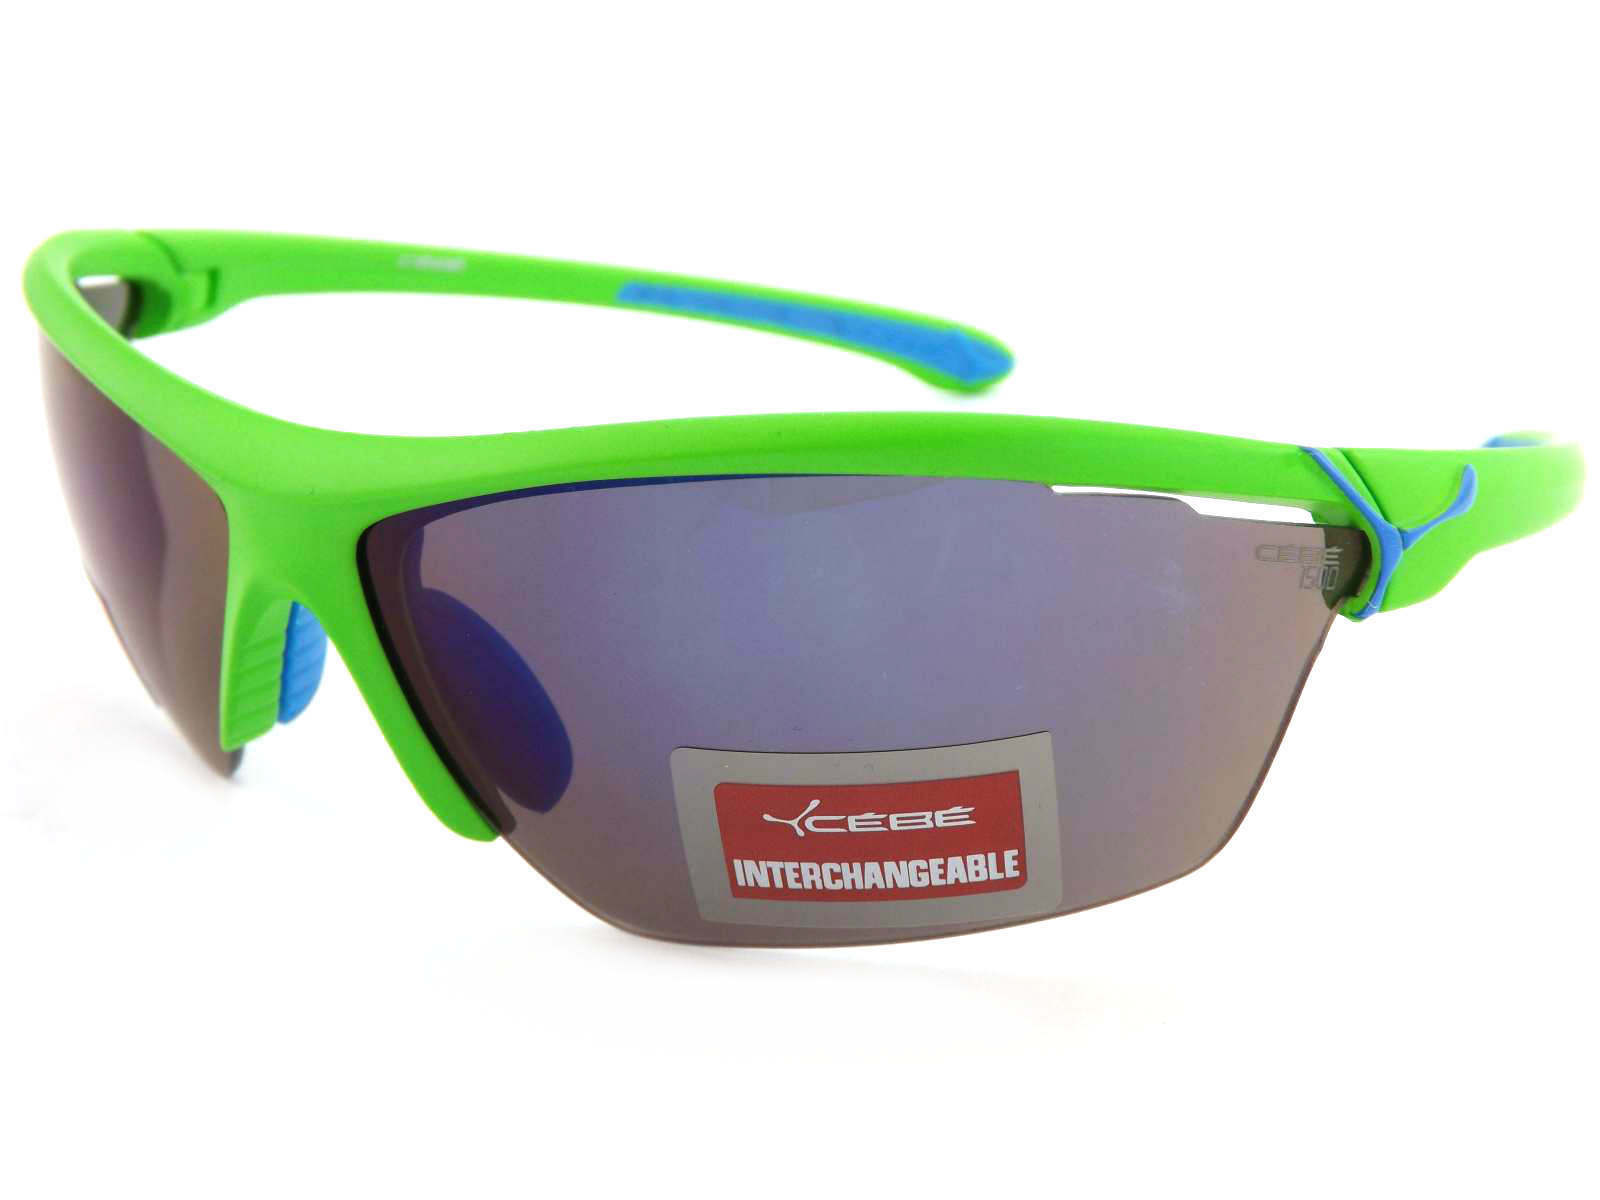 Cebe S/'Track Large Light Sensitive Sunglasses Matt White Variochrome CBSTL14